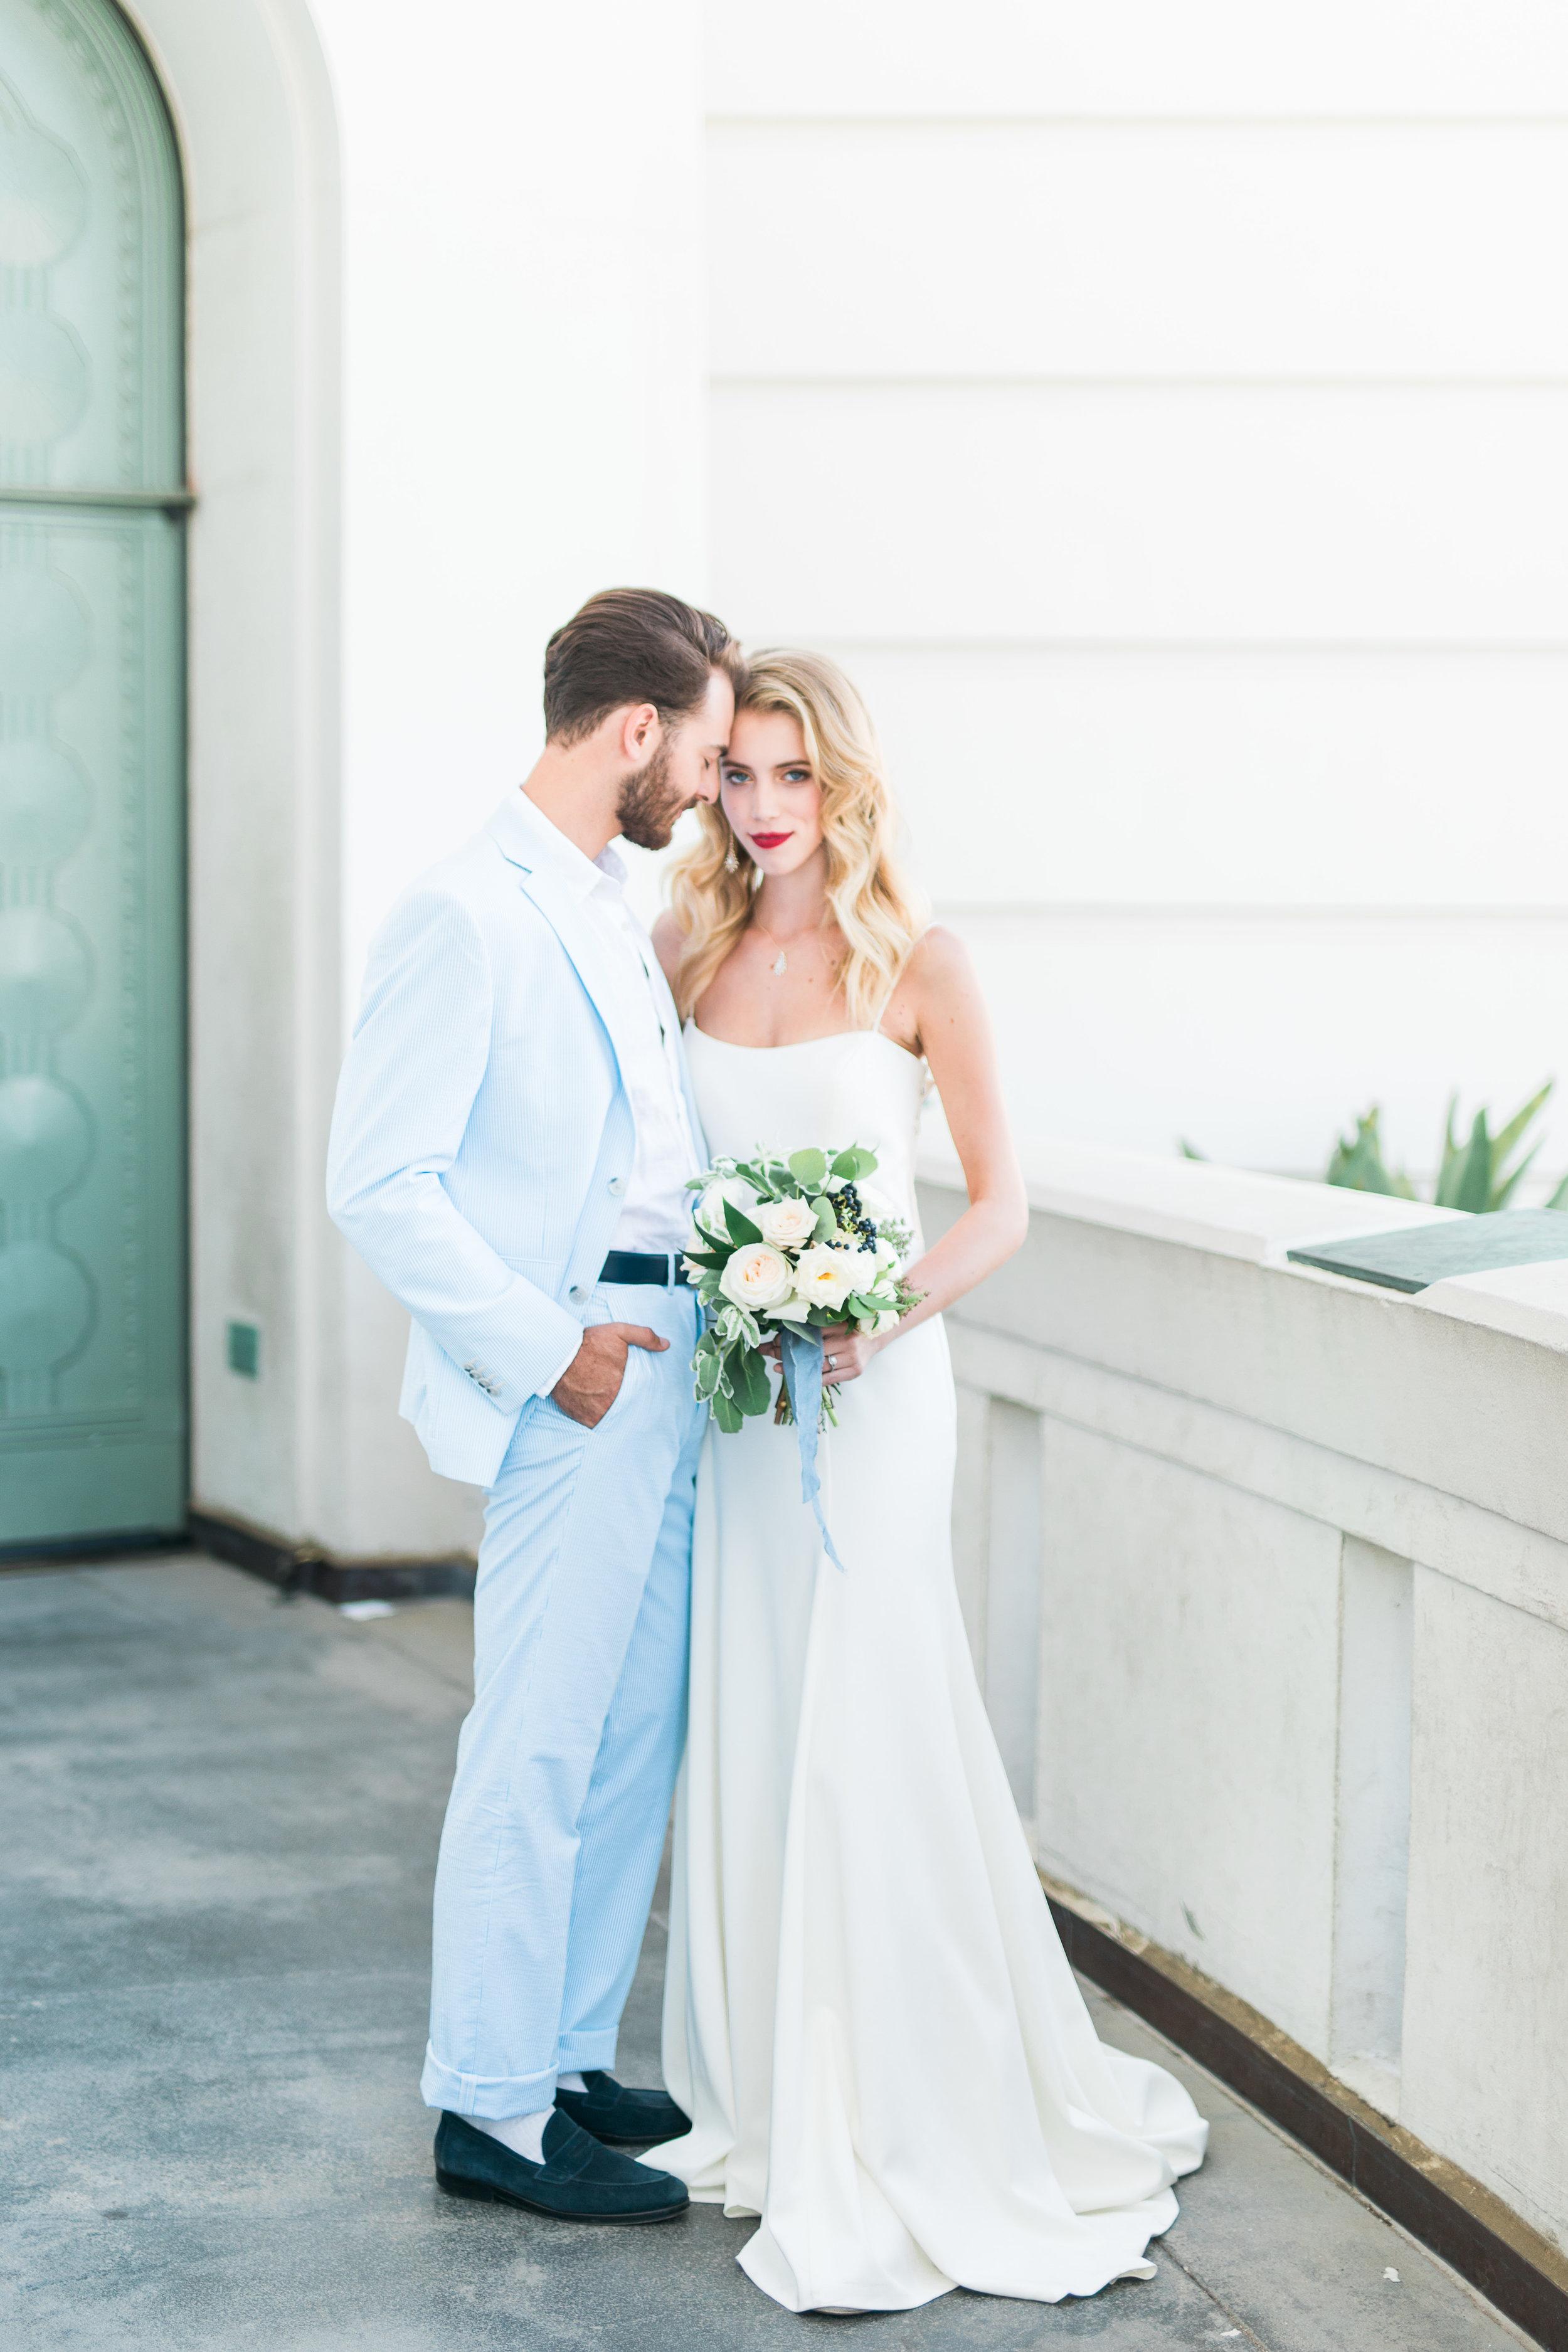 LA-Wedding-Shoot-by-JBJ-Pictures-74.jpg